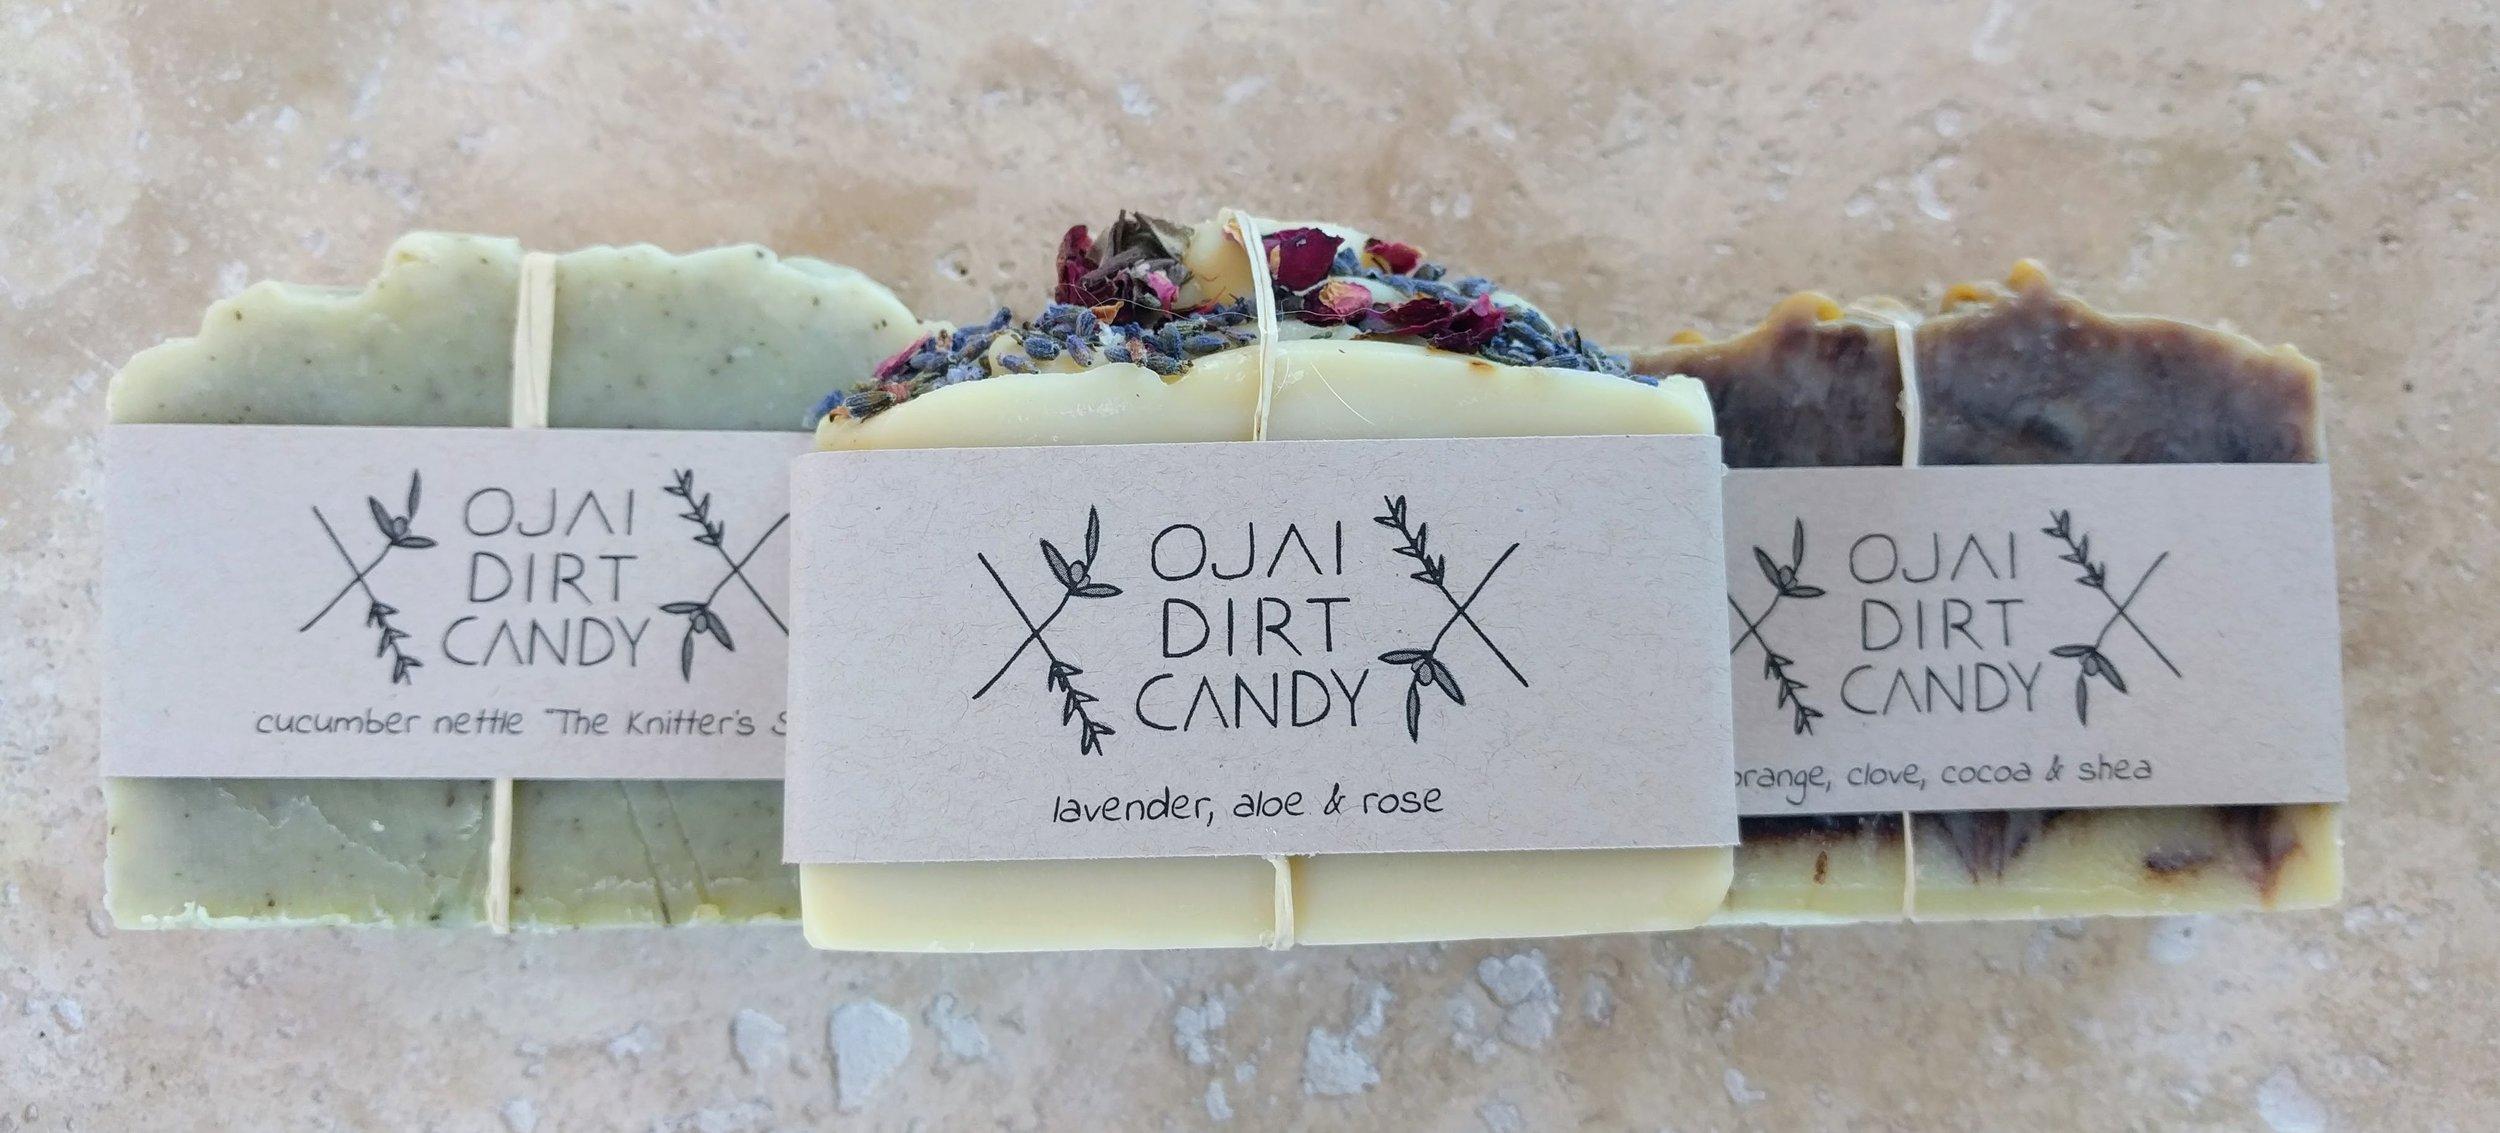 Ojai Dirt Candy handmade soap bars